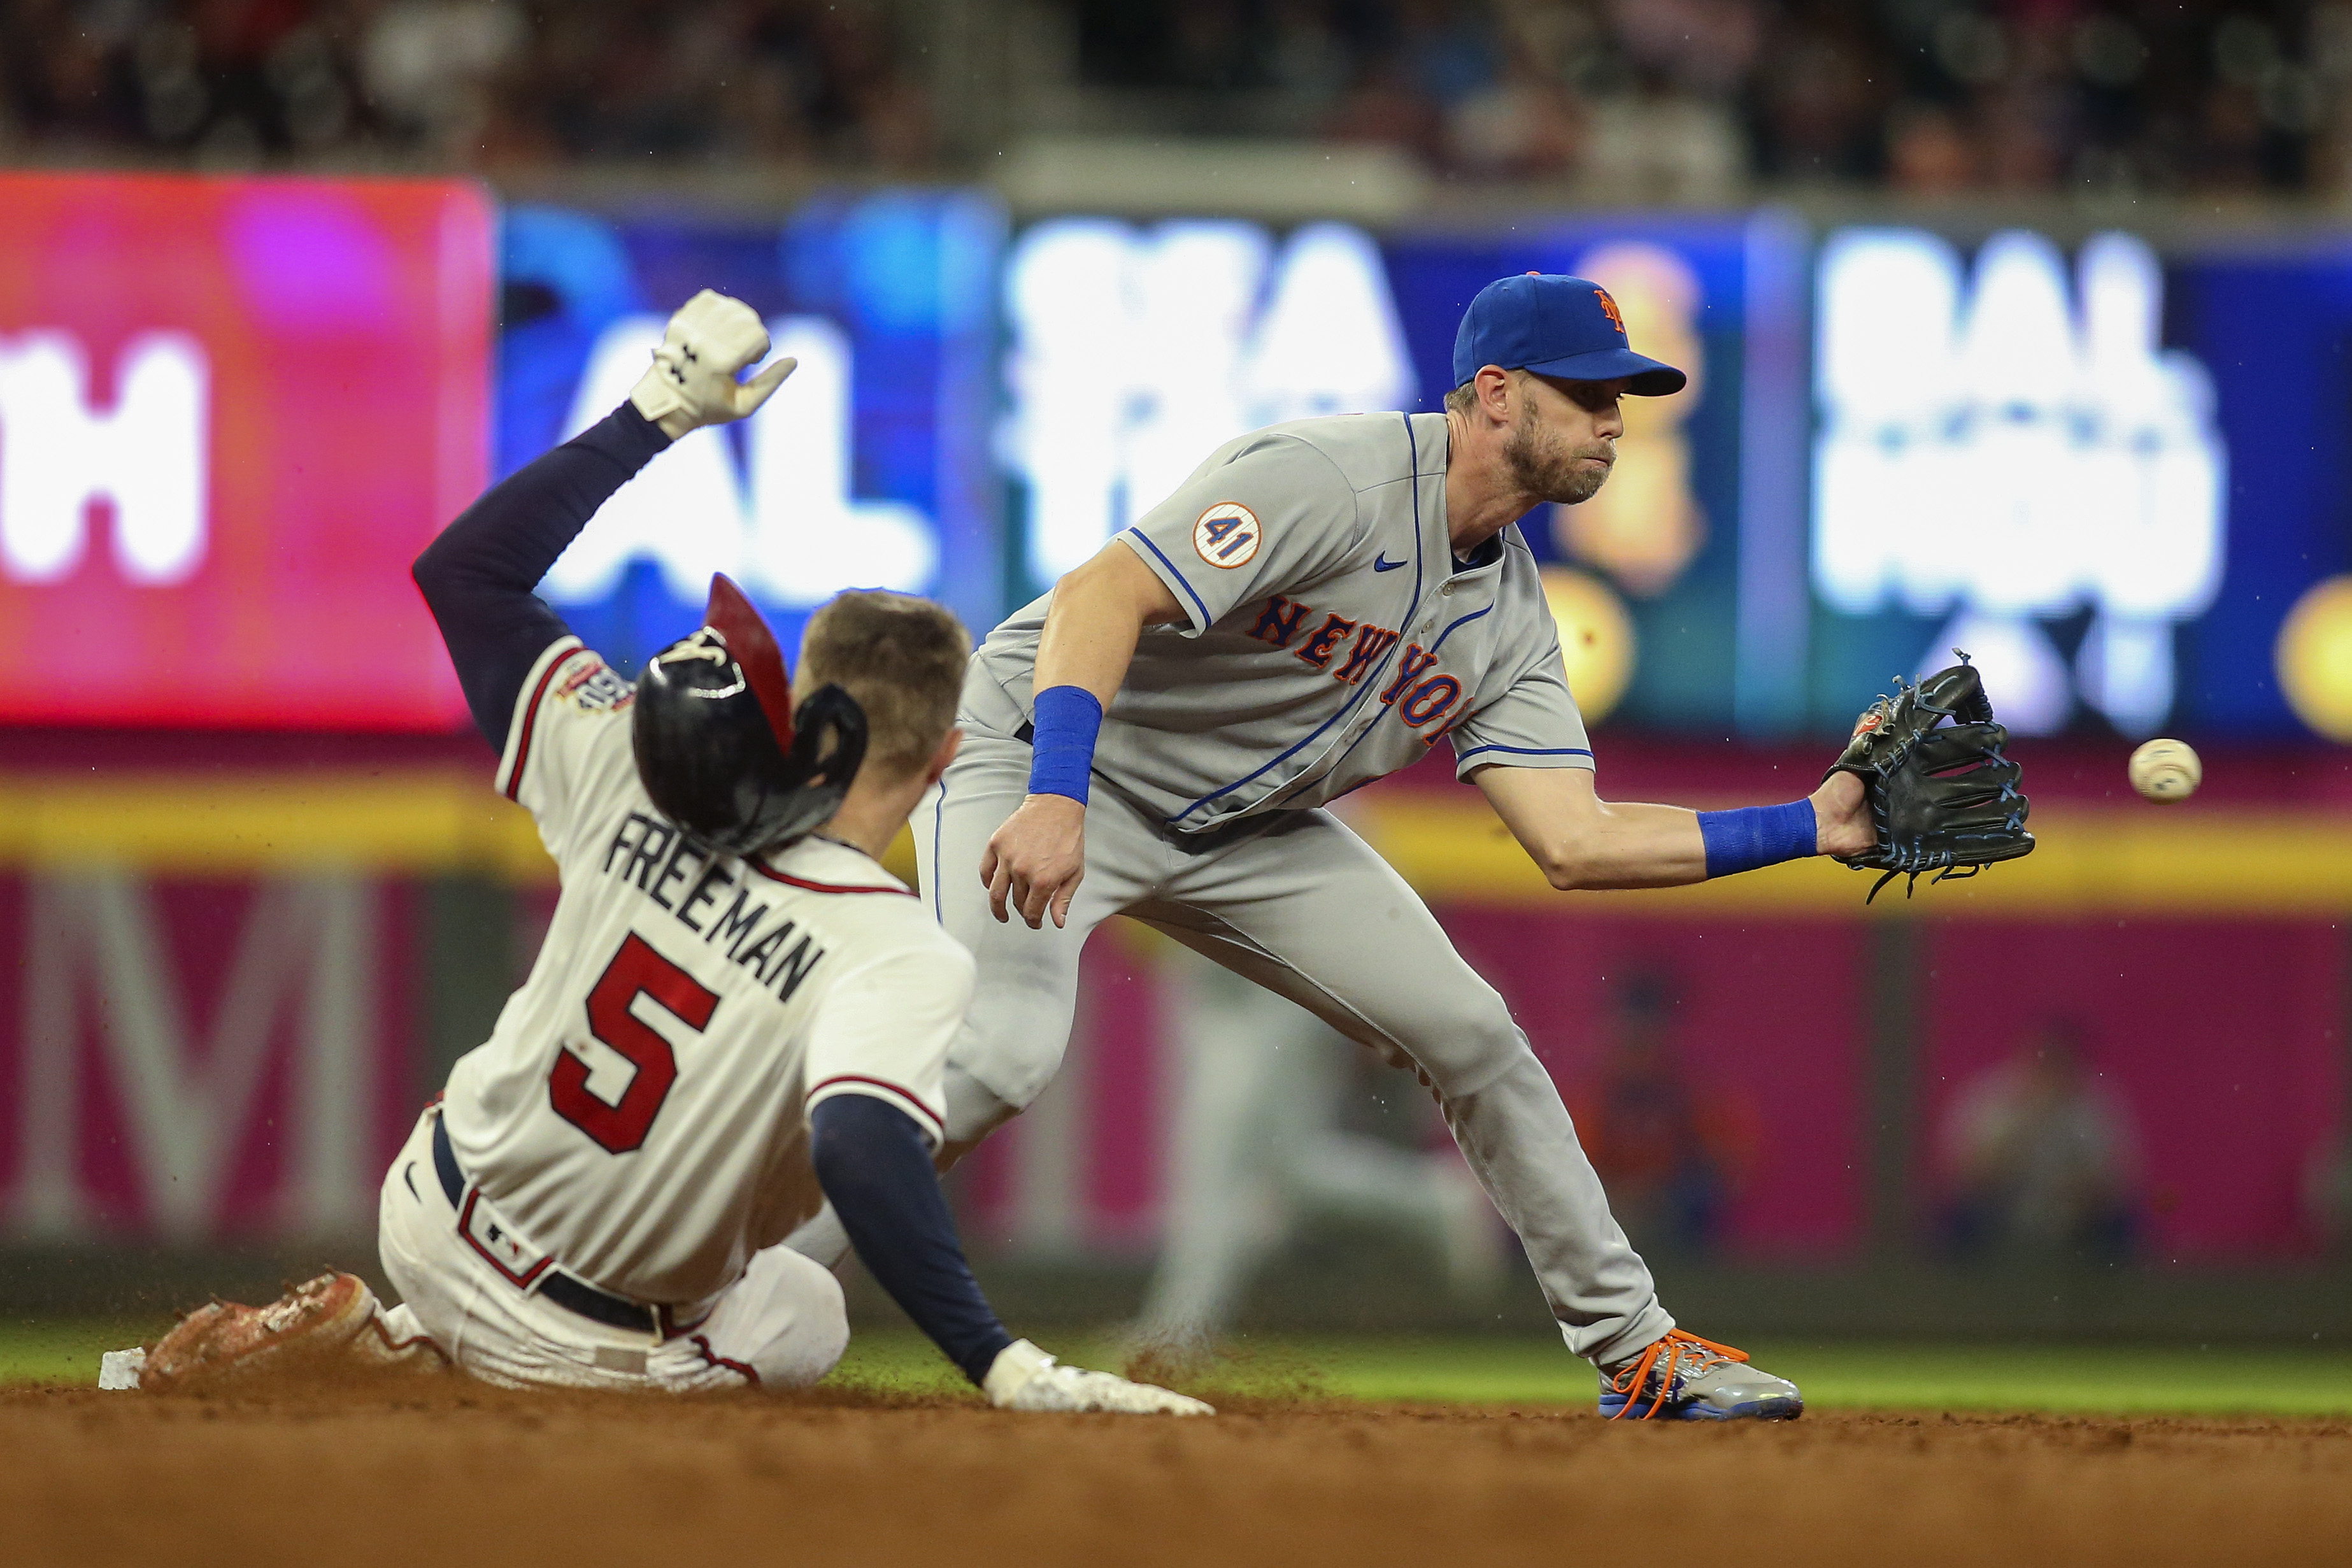 7/1/21 Game Preview: New York Mets at Atlanta Braves